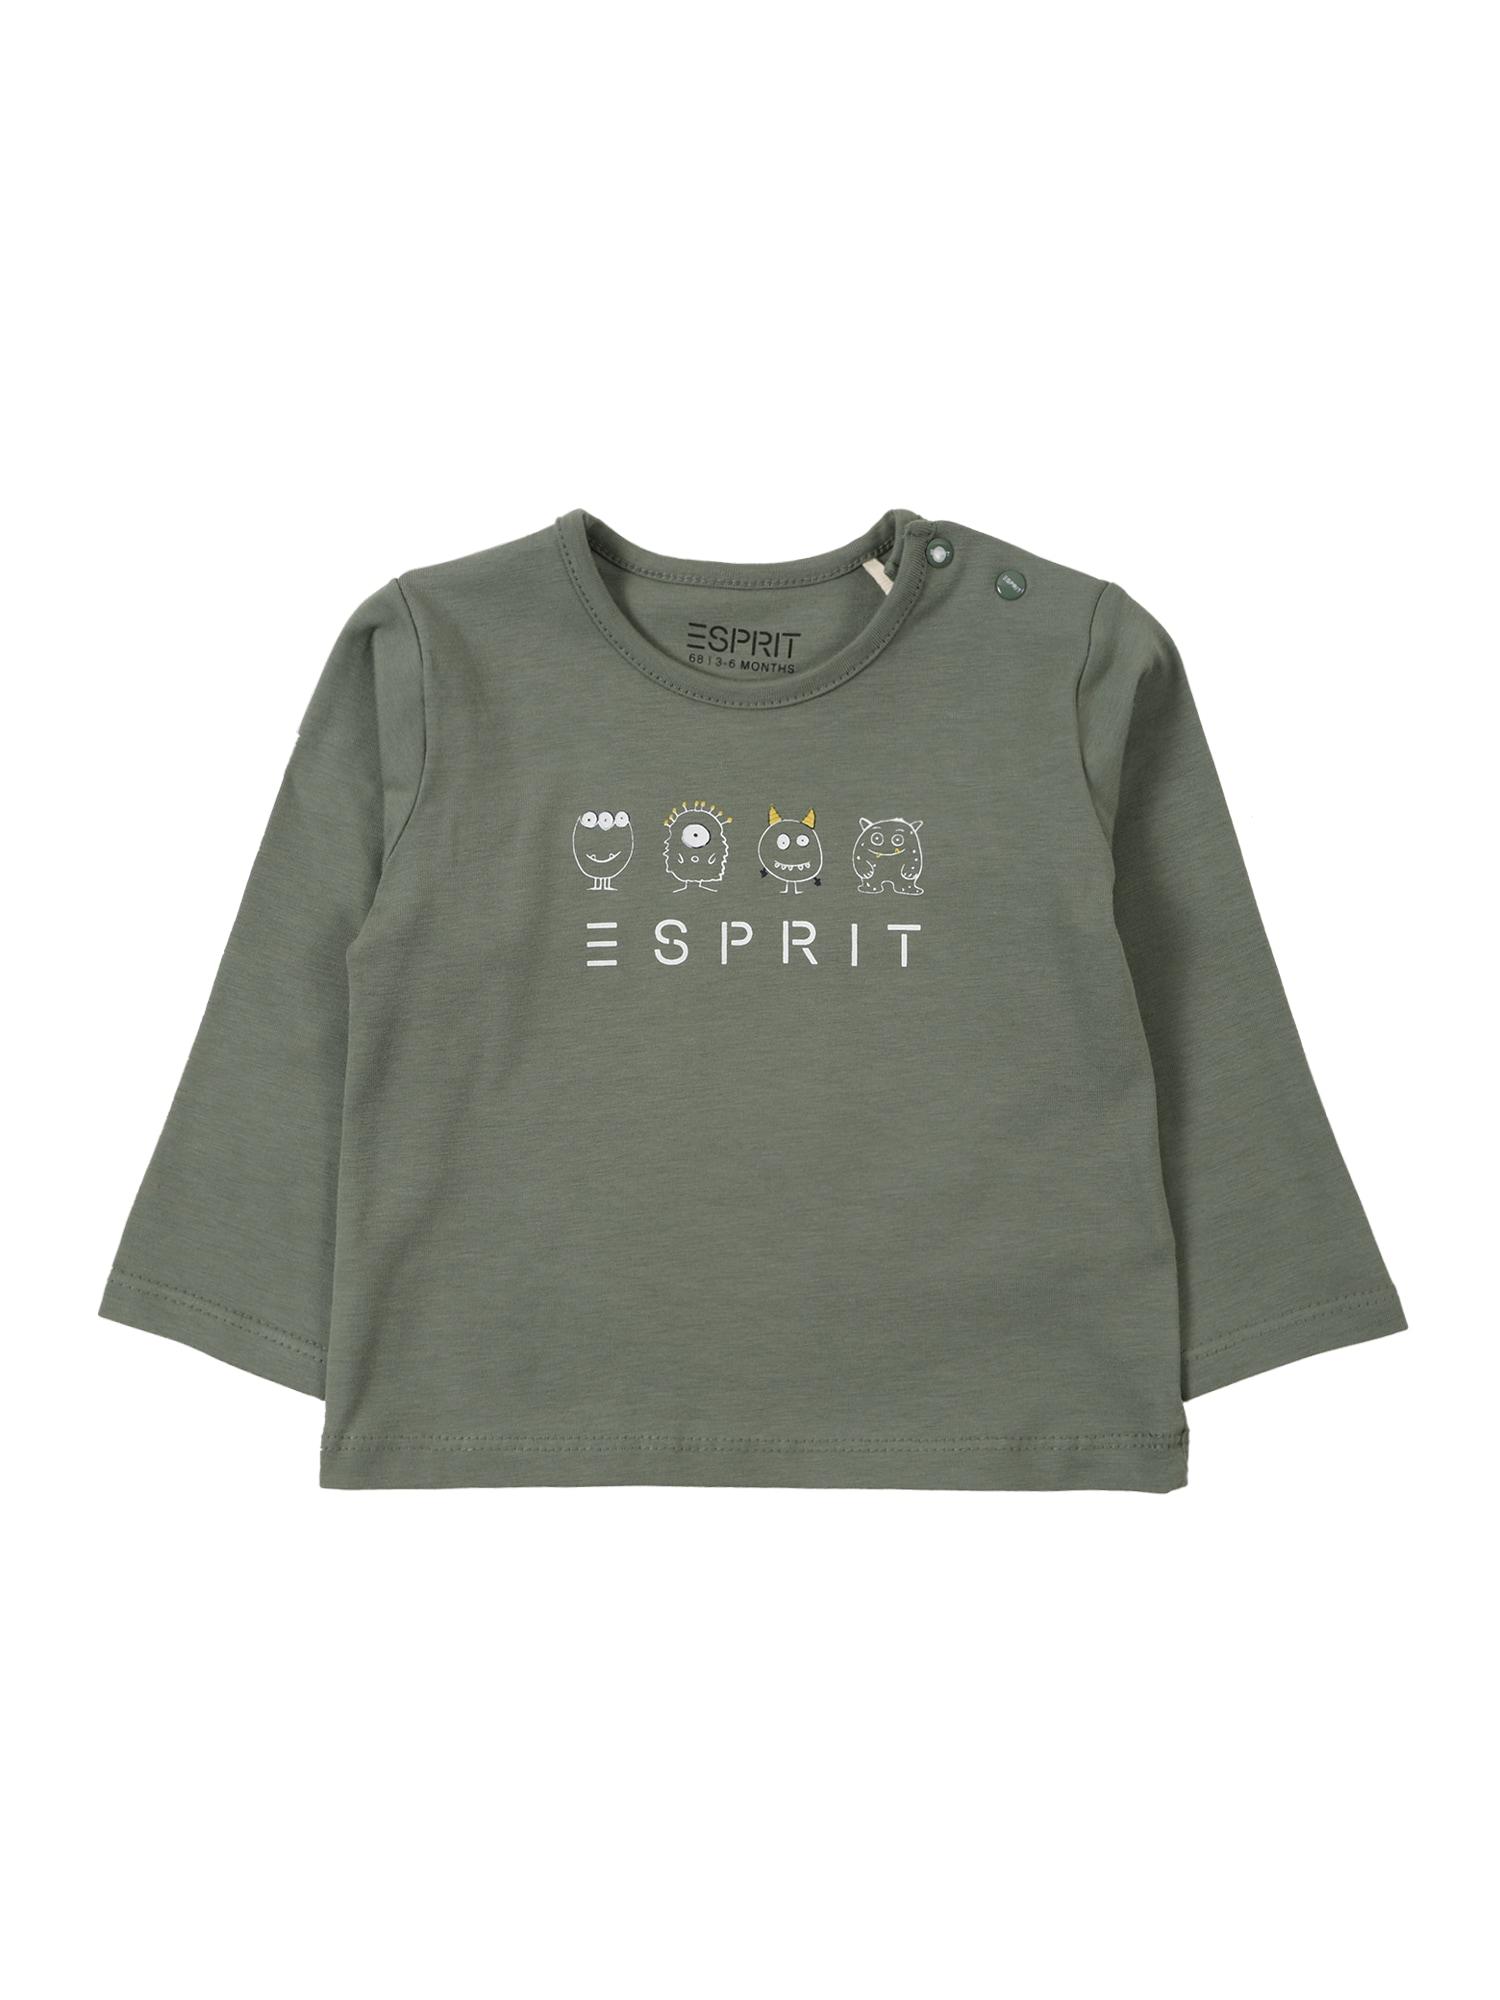 ESPRIT Tričko  olivová / bílá